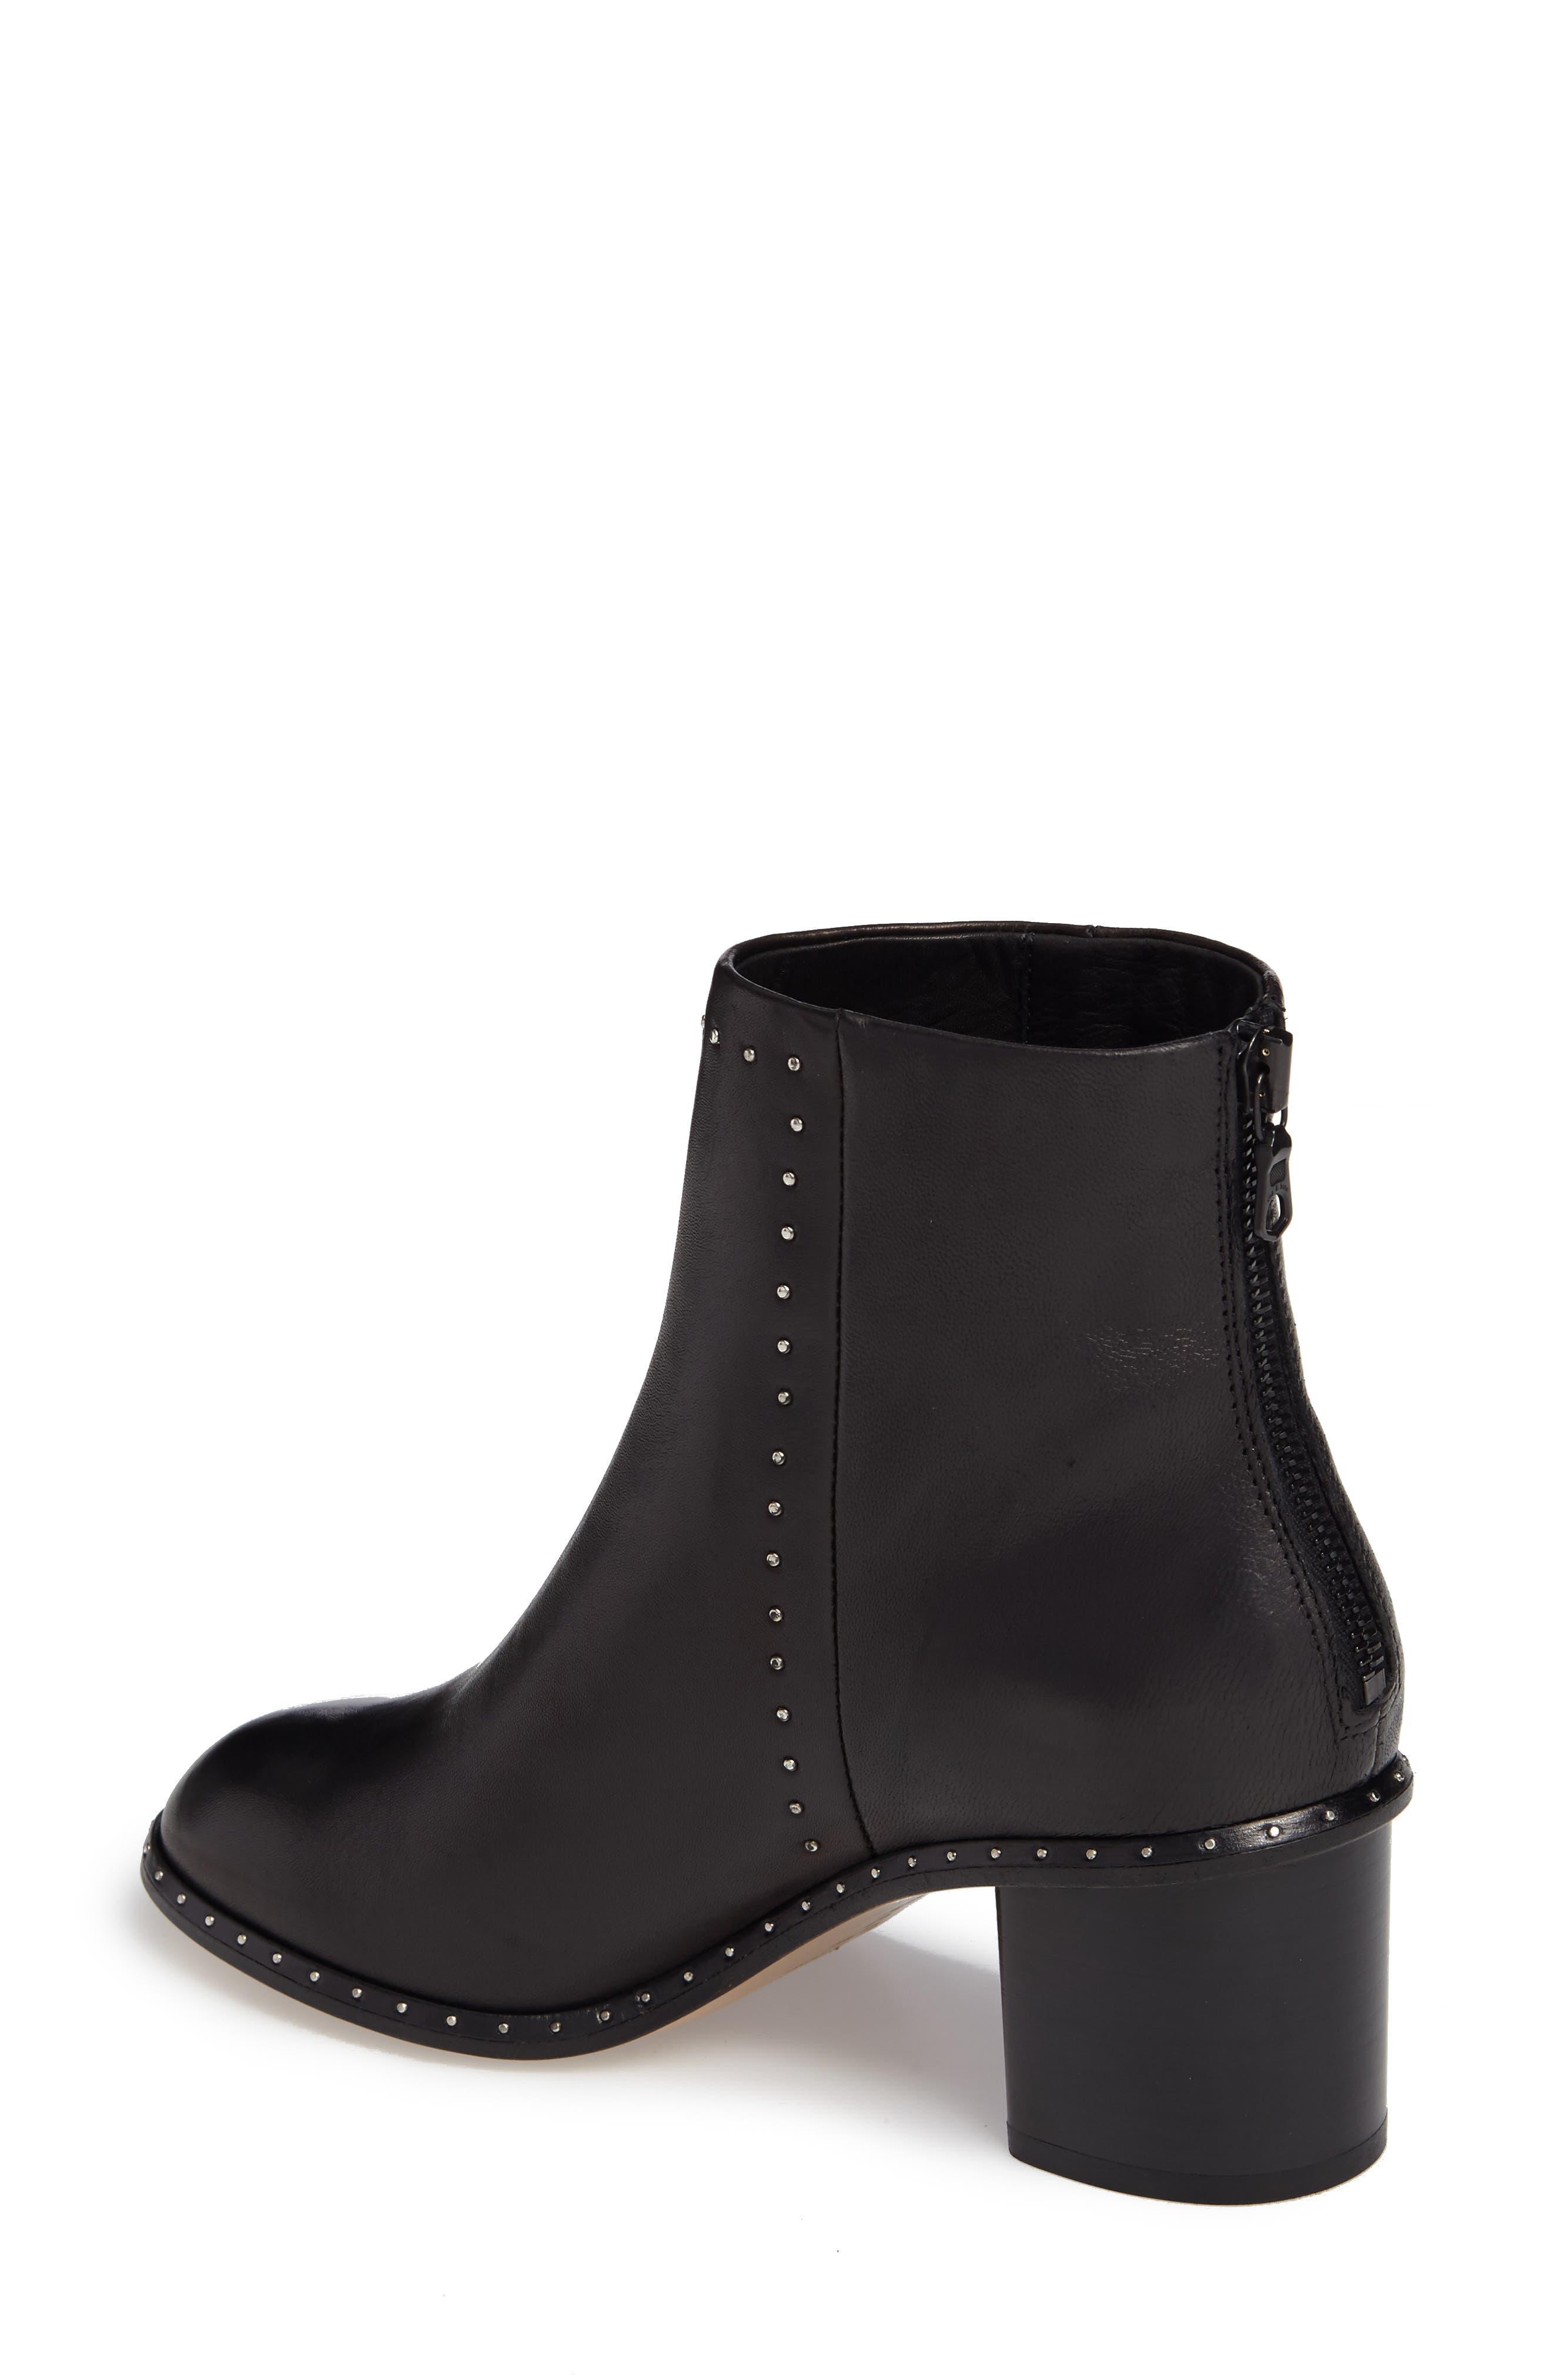 5ccb39f106b4 Women s Rag   Bone Boots